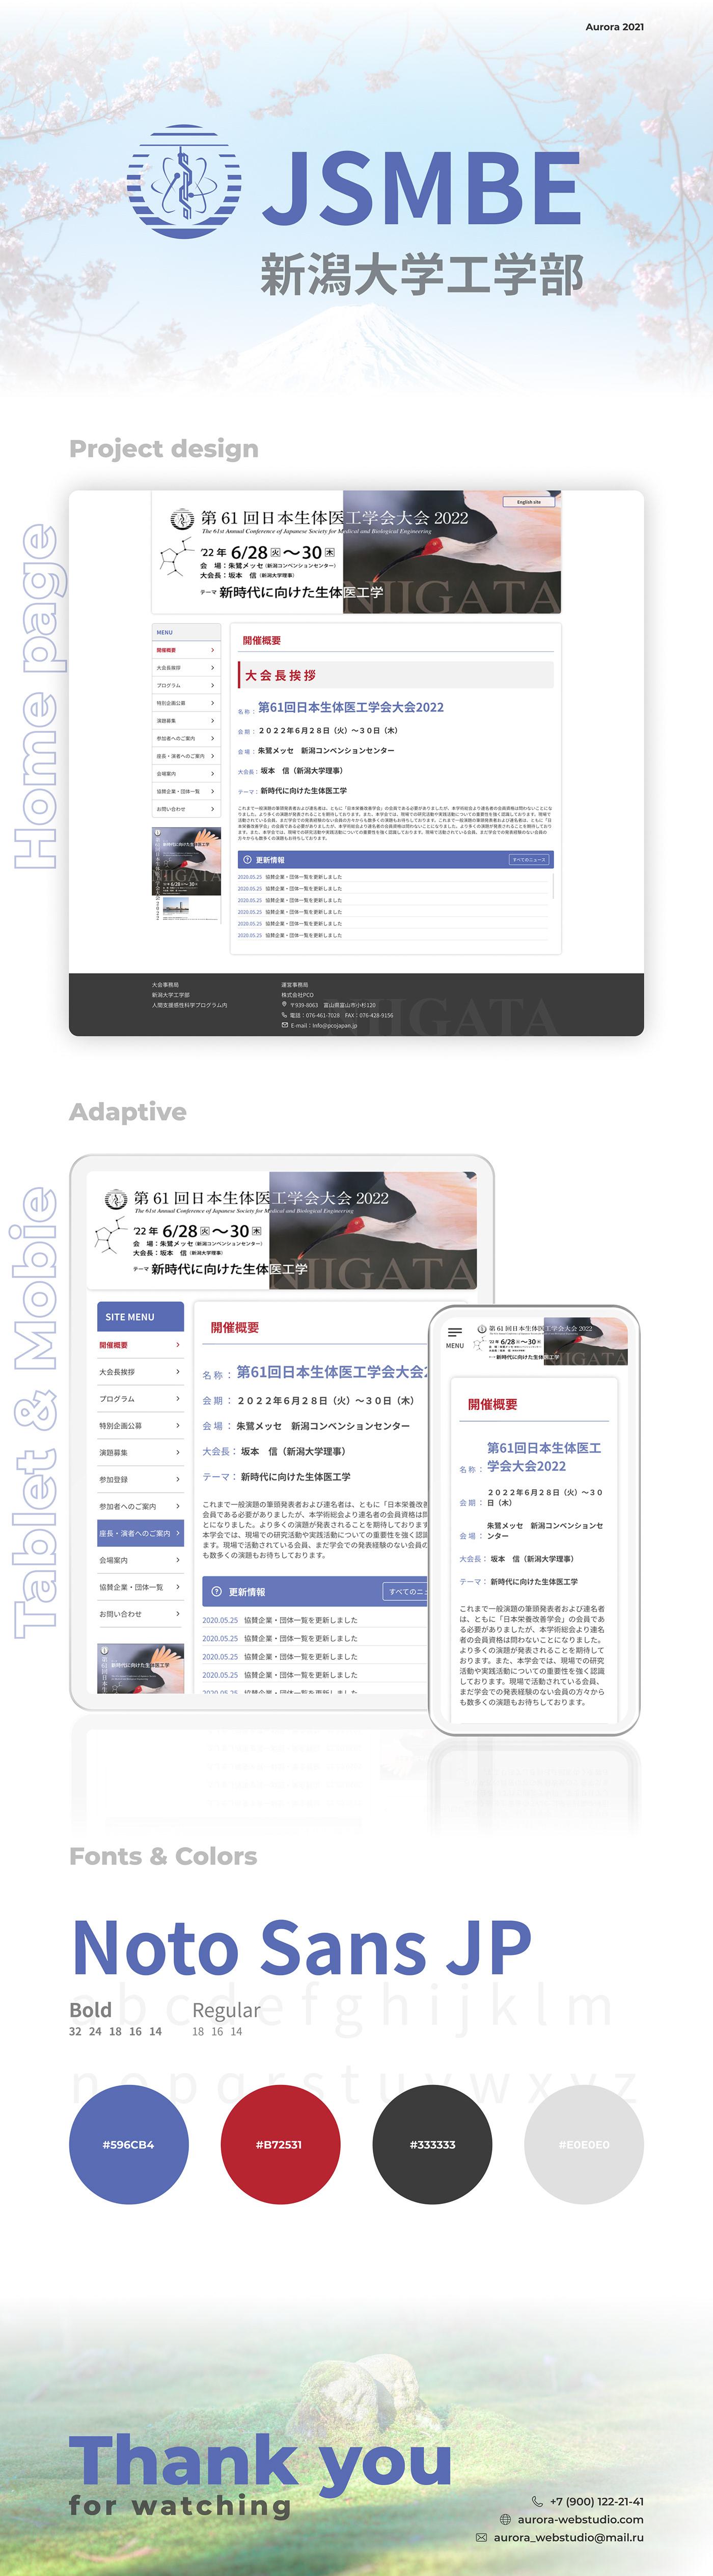 conference japan Aurora web studio Japanese conference JSMBE landing medicine promo site UI ux